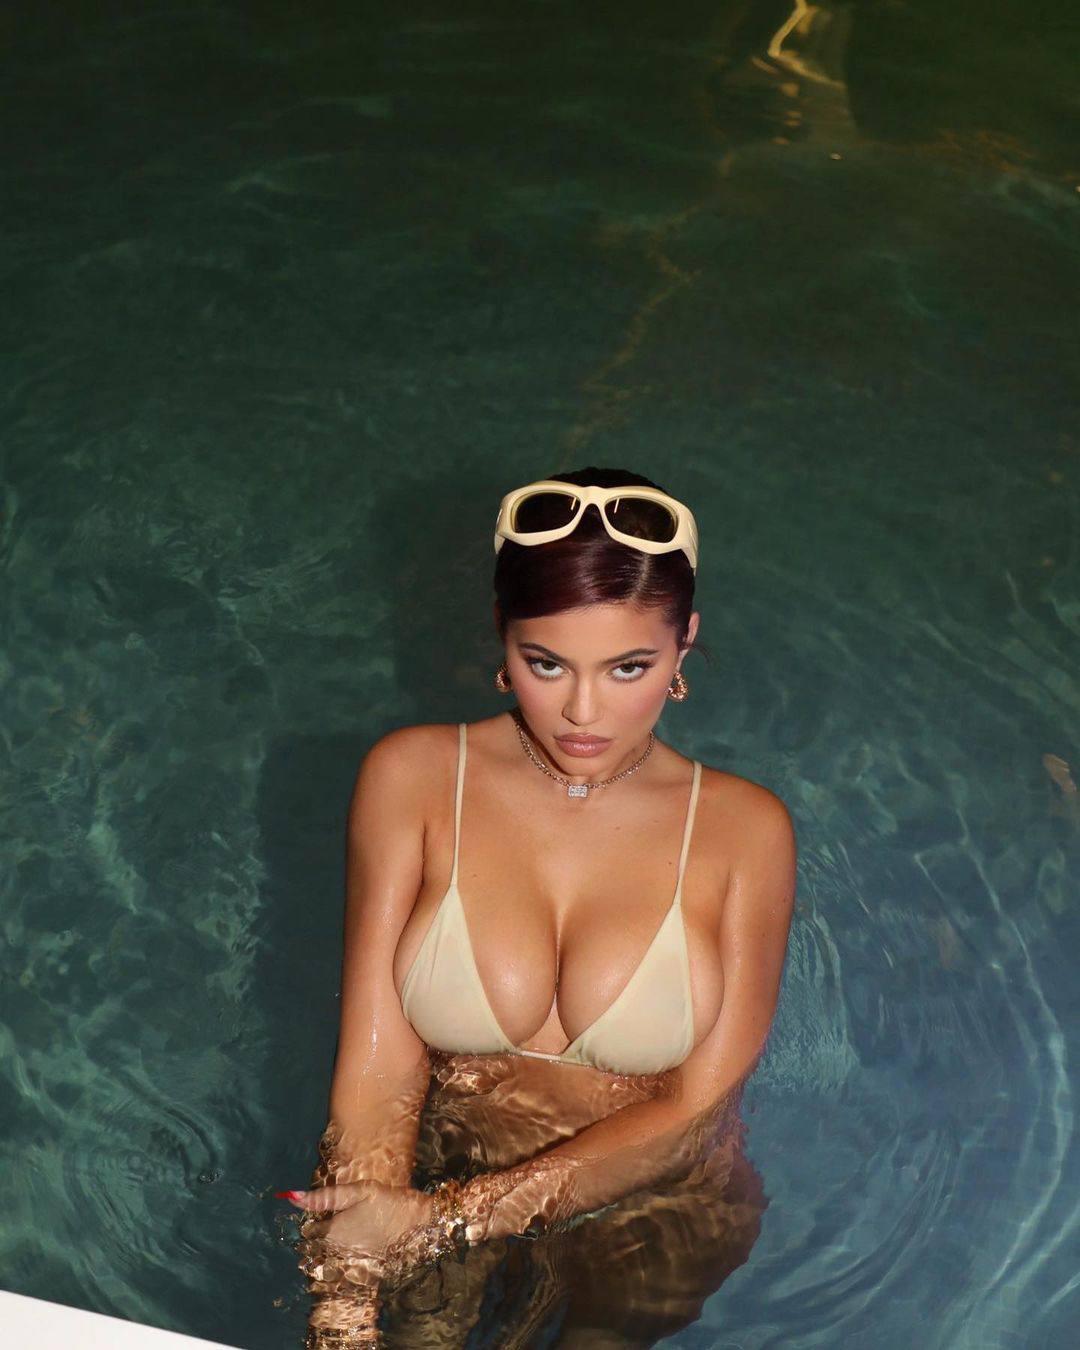 Kylie Jenner Beautiful Big Boobs